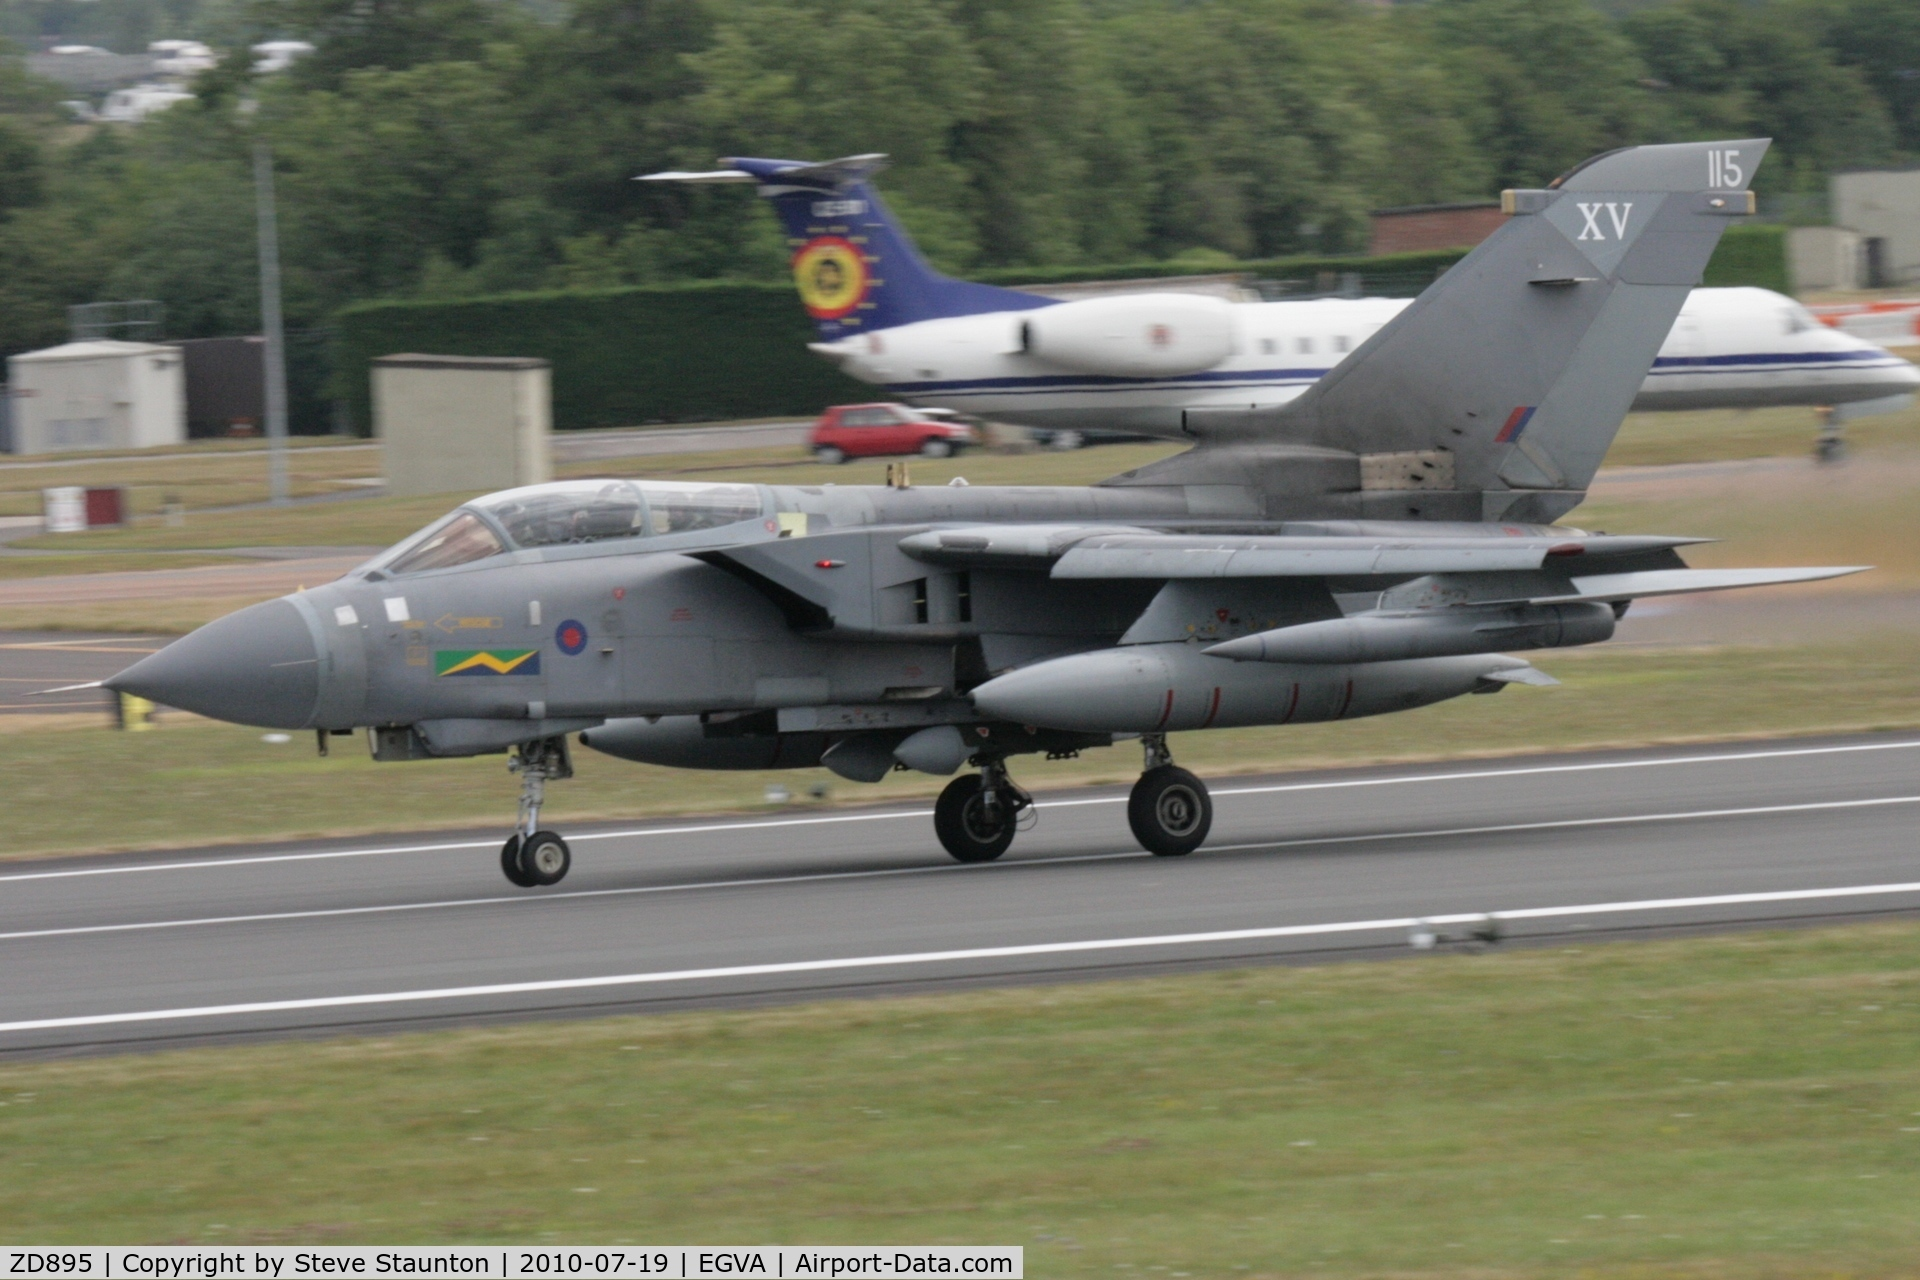 ZD895, 1985 Panavia Tornado GR.4 C/N 477/BS155/3216, Taken at the Royal International Air Tattoo 2010